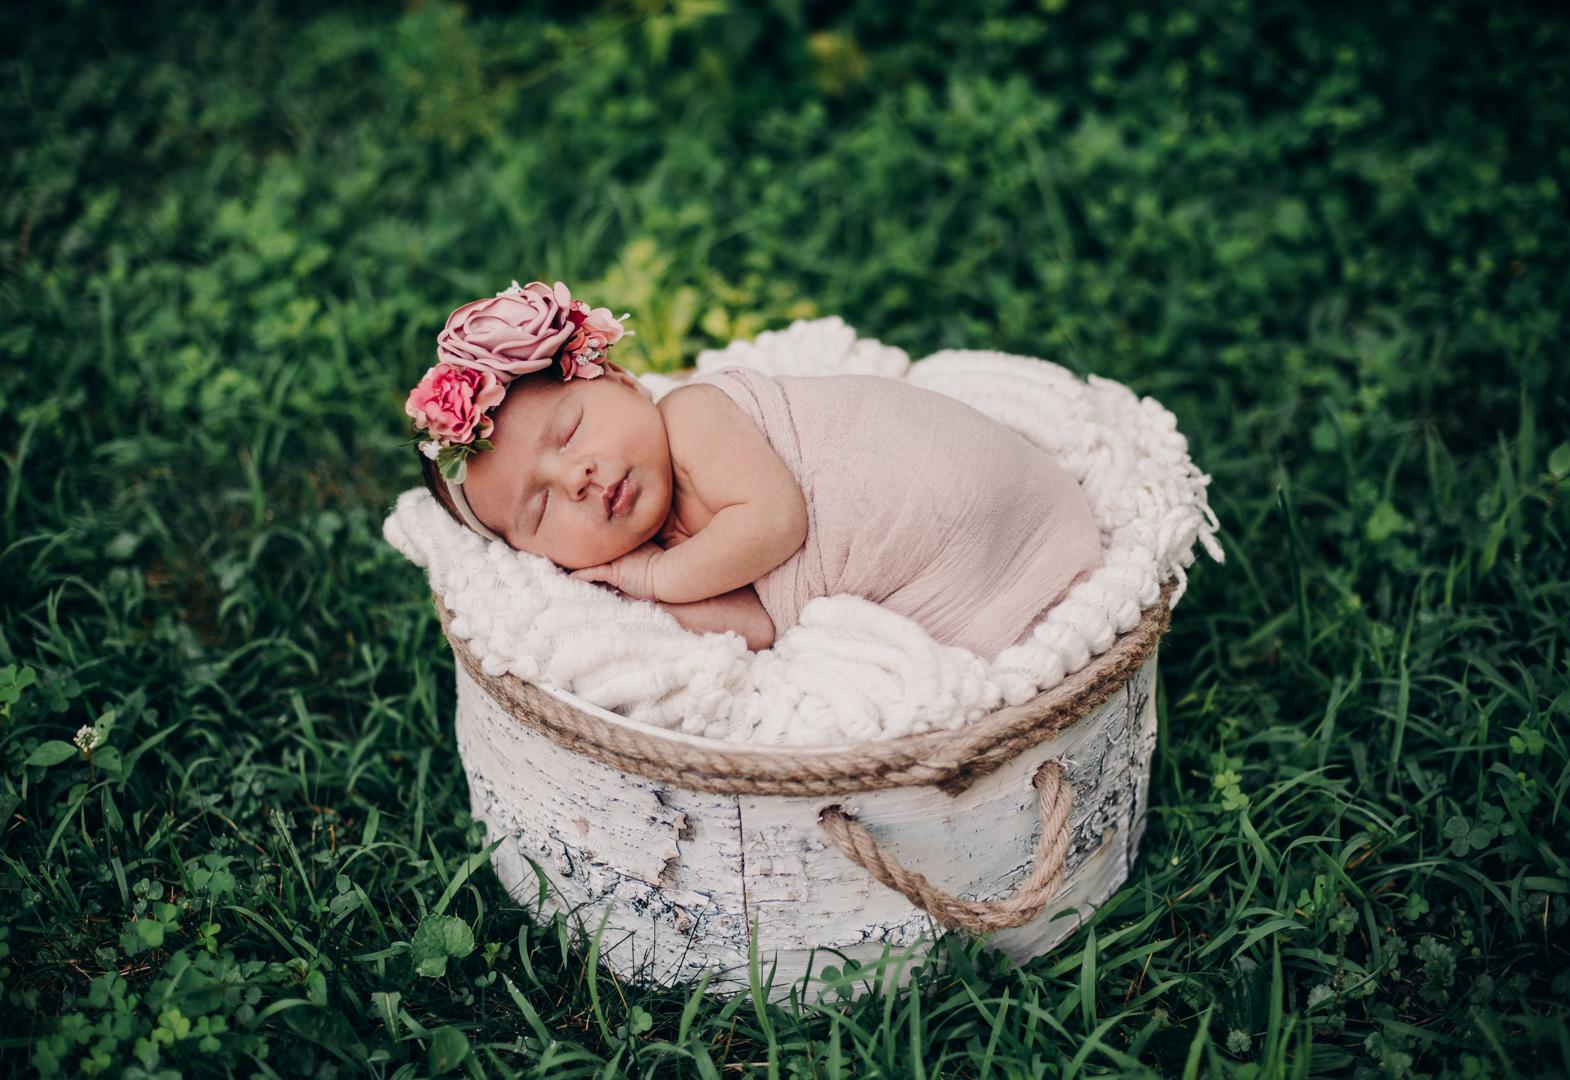 TerraSuraPhotography-Sloane Vasseur Family Newborn-Web-4466.jpg